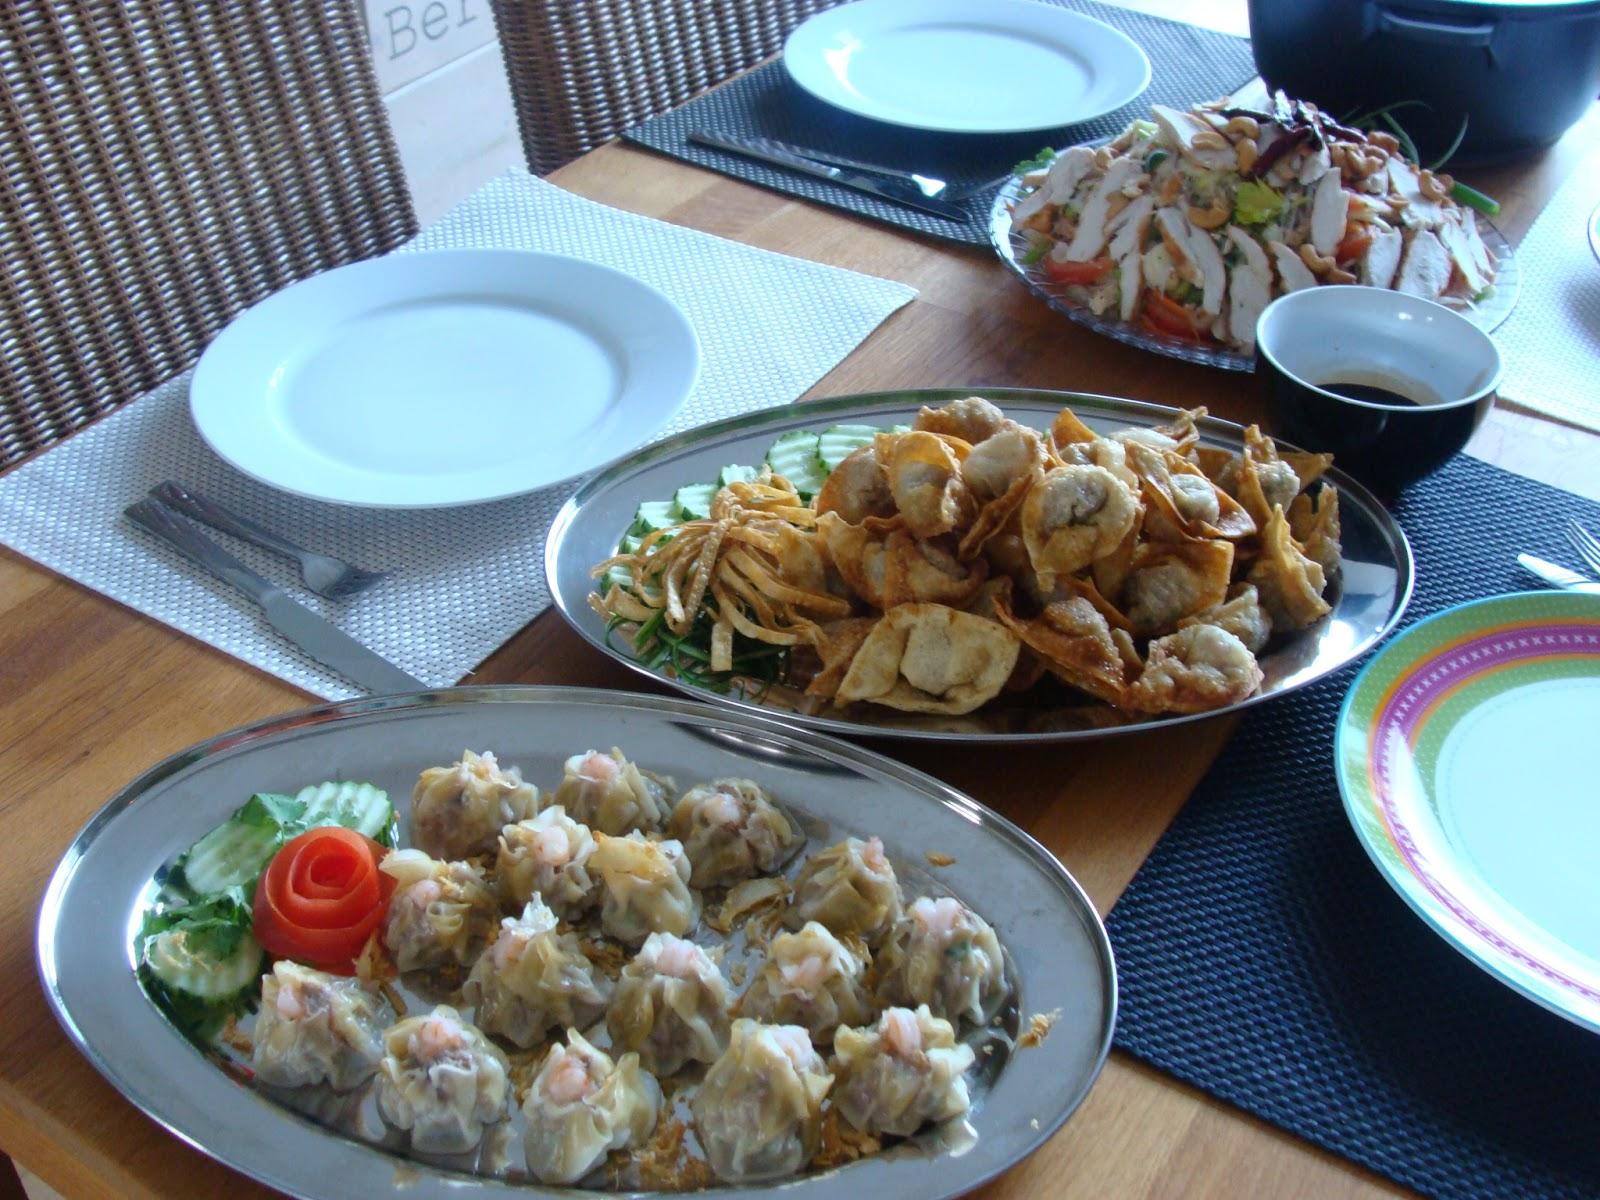 Makkelijk Thais Eten Simple Thai Food อาหารไทยง ายๆ Thaise